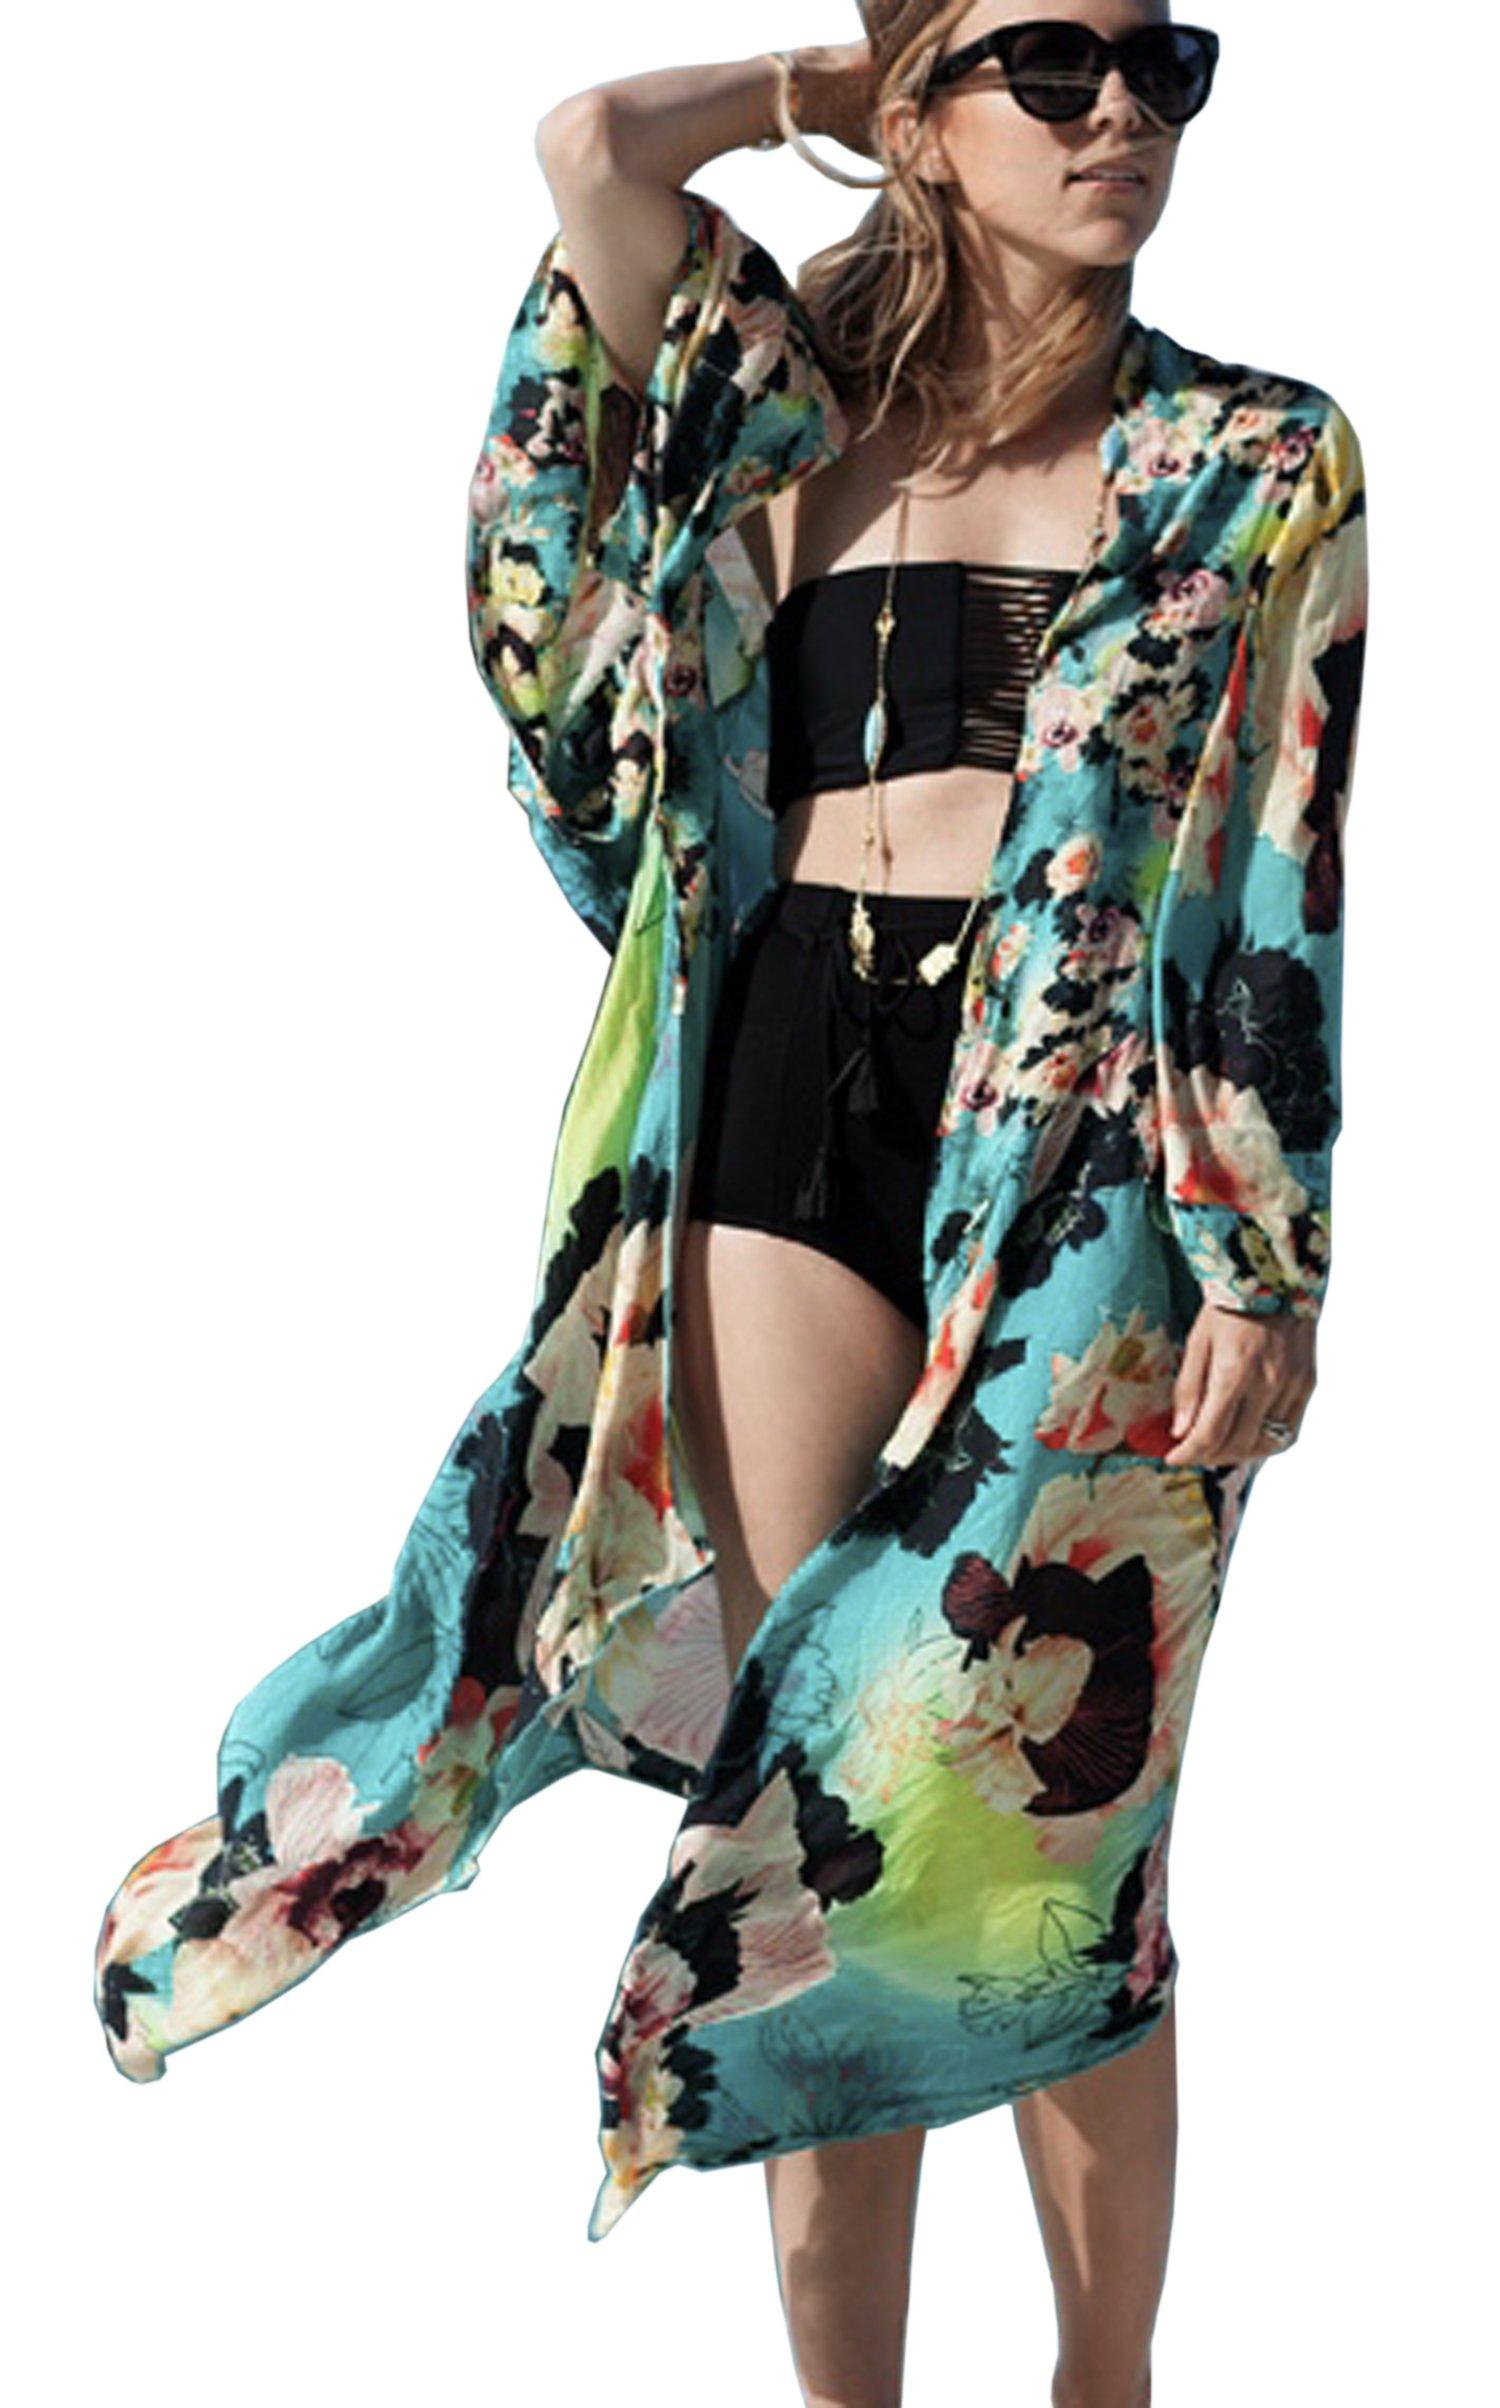 Hibluco Women's Fashion Floral Print Kimono Cardigan Long Tops Loose Cover Ups (Large, K 67)